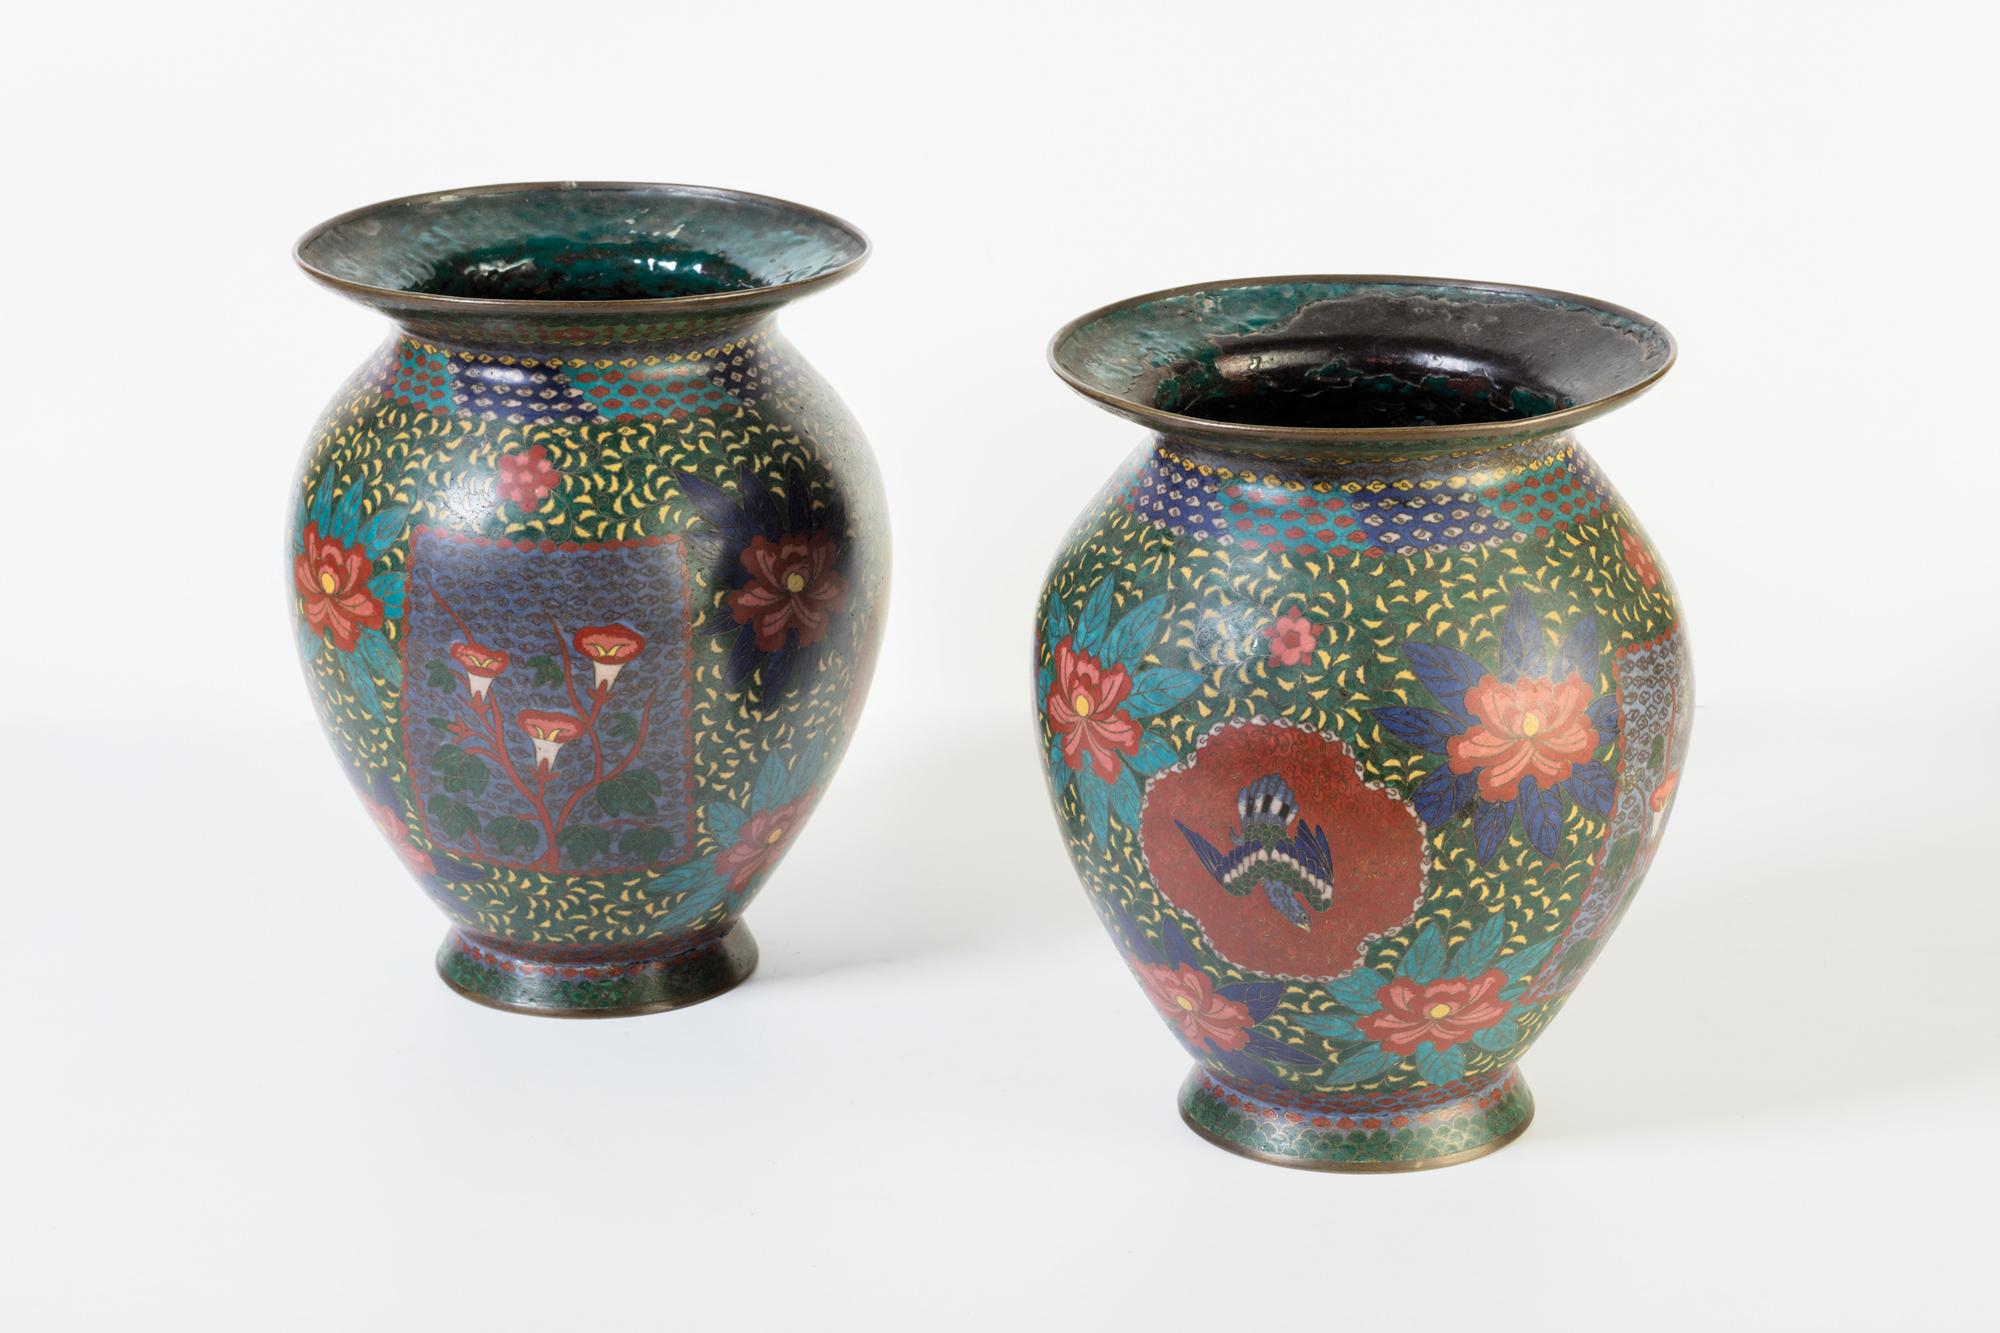 Manifattura cinese secolo xix coppia di vasi cloisonn for Vasi di fiori dipinti